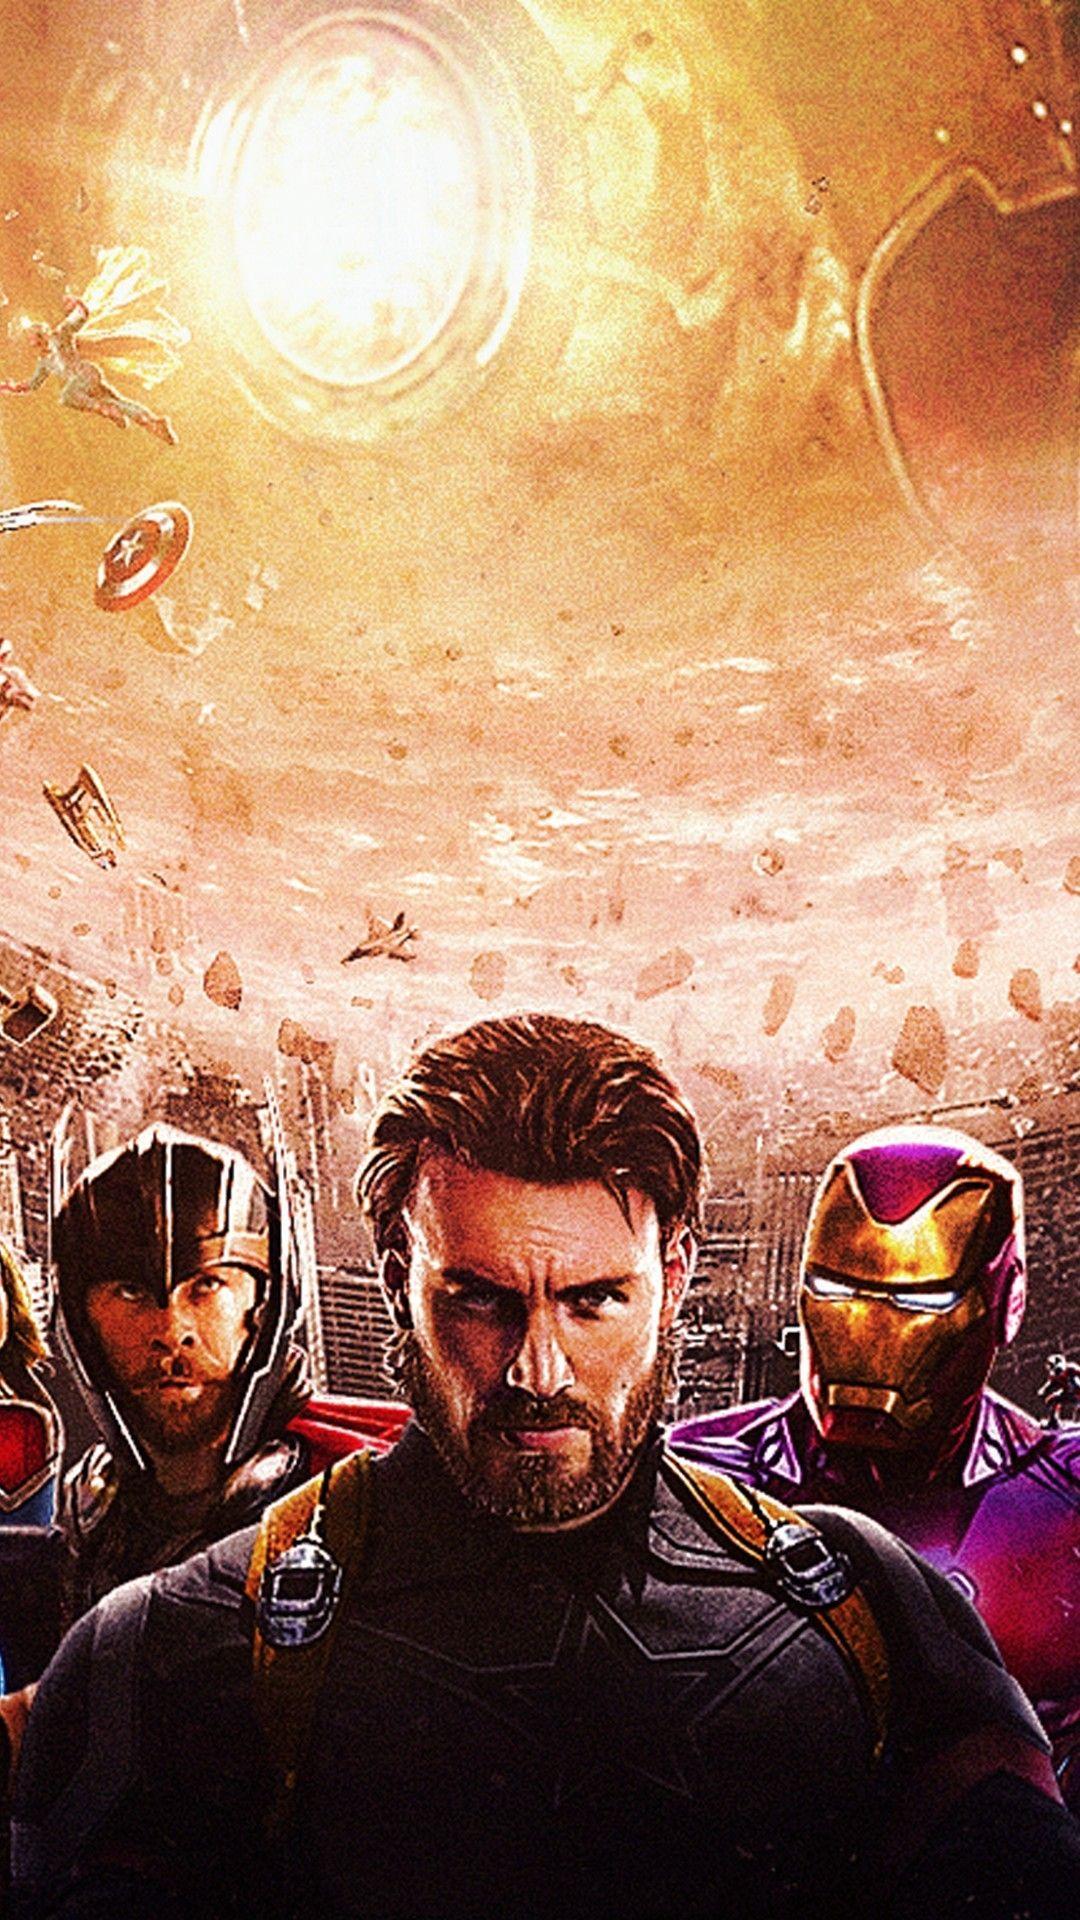 Avengers 3 Wallpaper For Iphone Best Iphone Wallpaper Witch Wallpaper Avengers Wallpaper Superhero Wallpaper